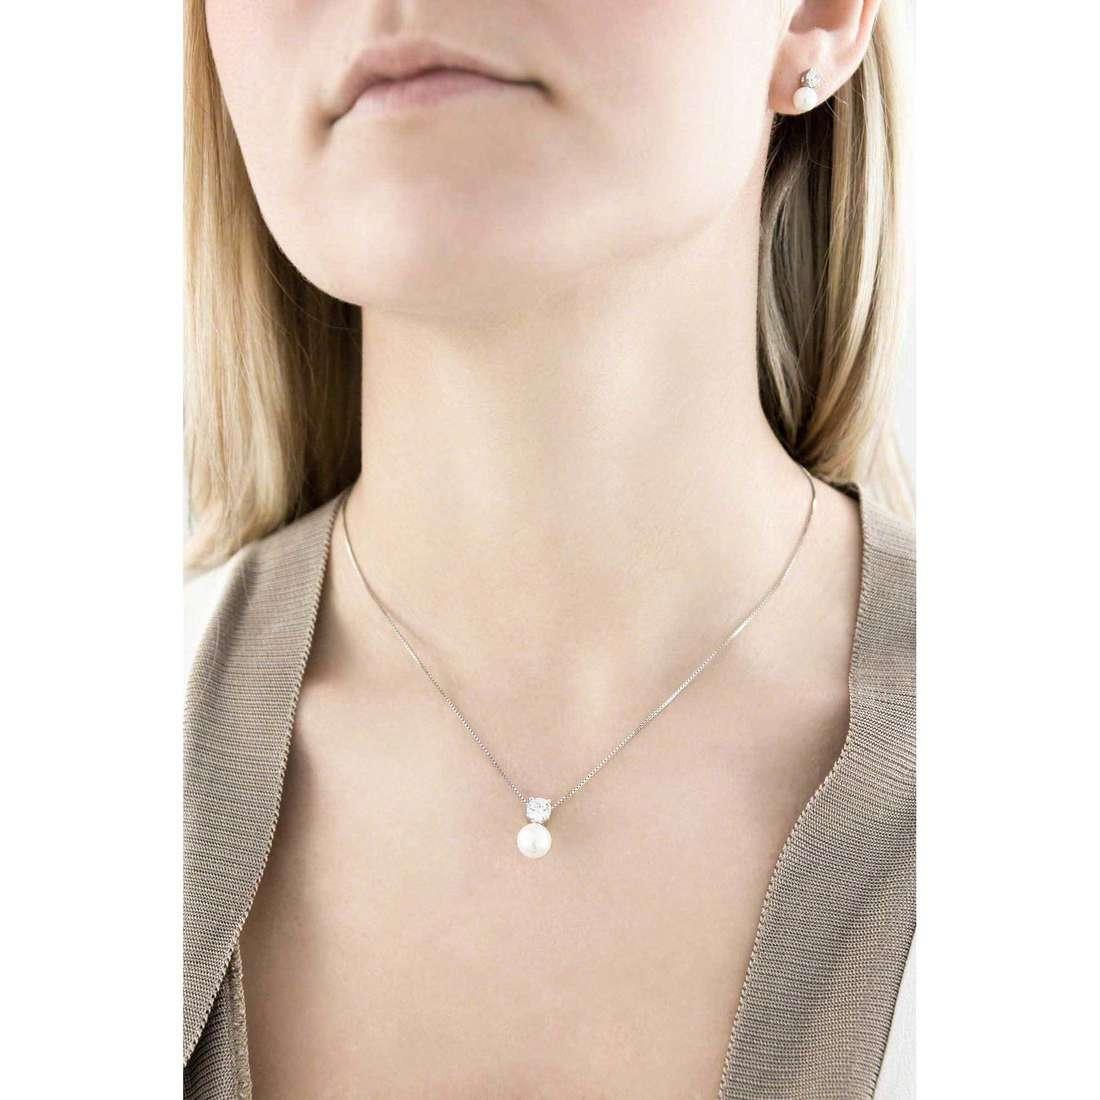 GioiaPura colliers femme 29121-01-00 indosso